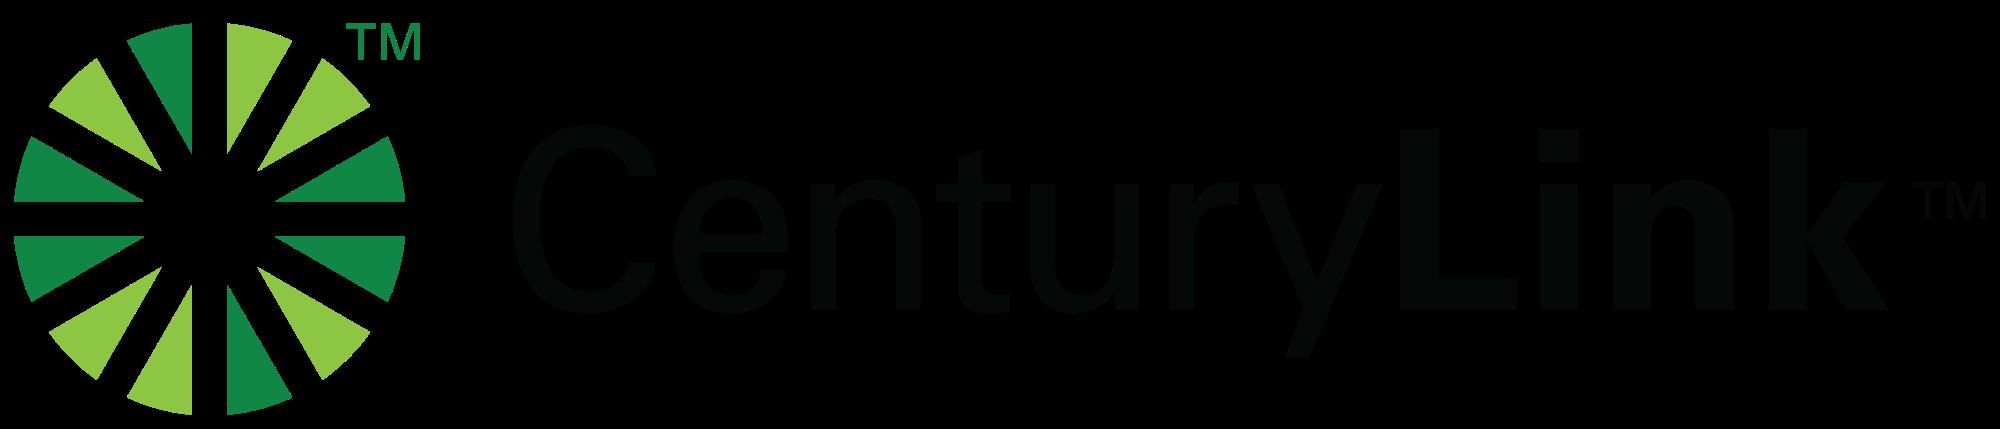 CenturyLink - high res.png